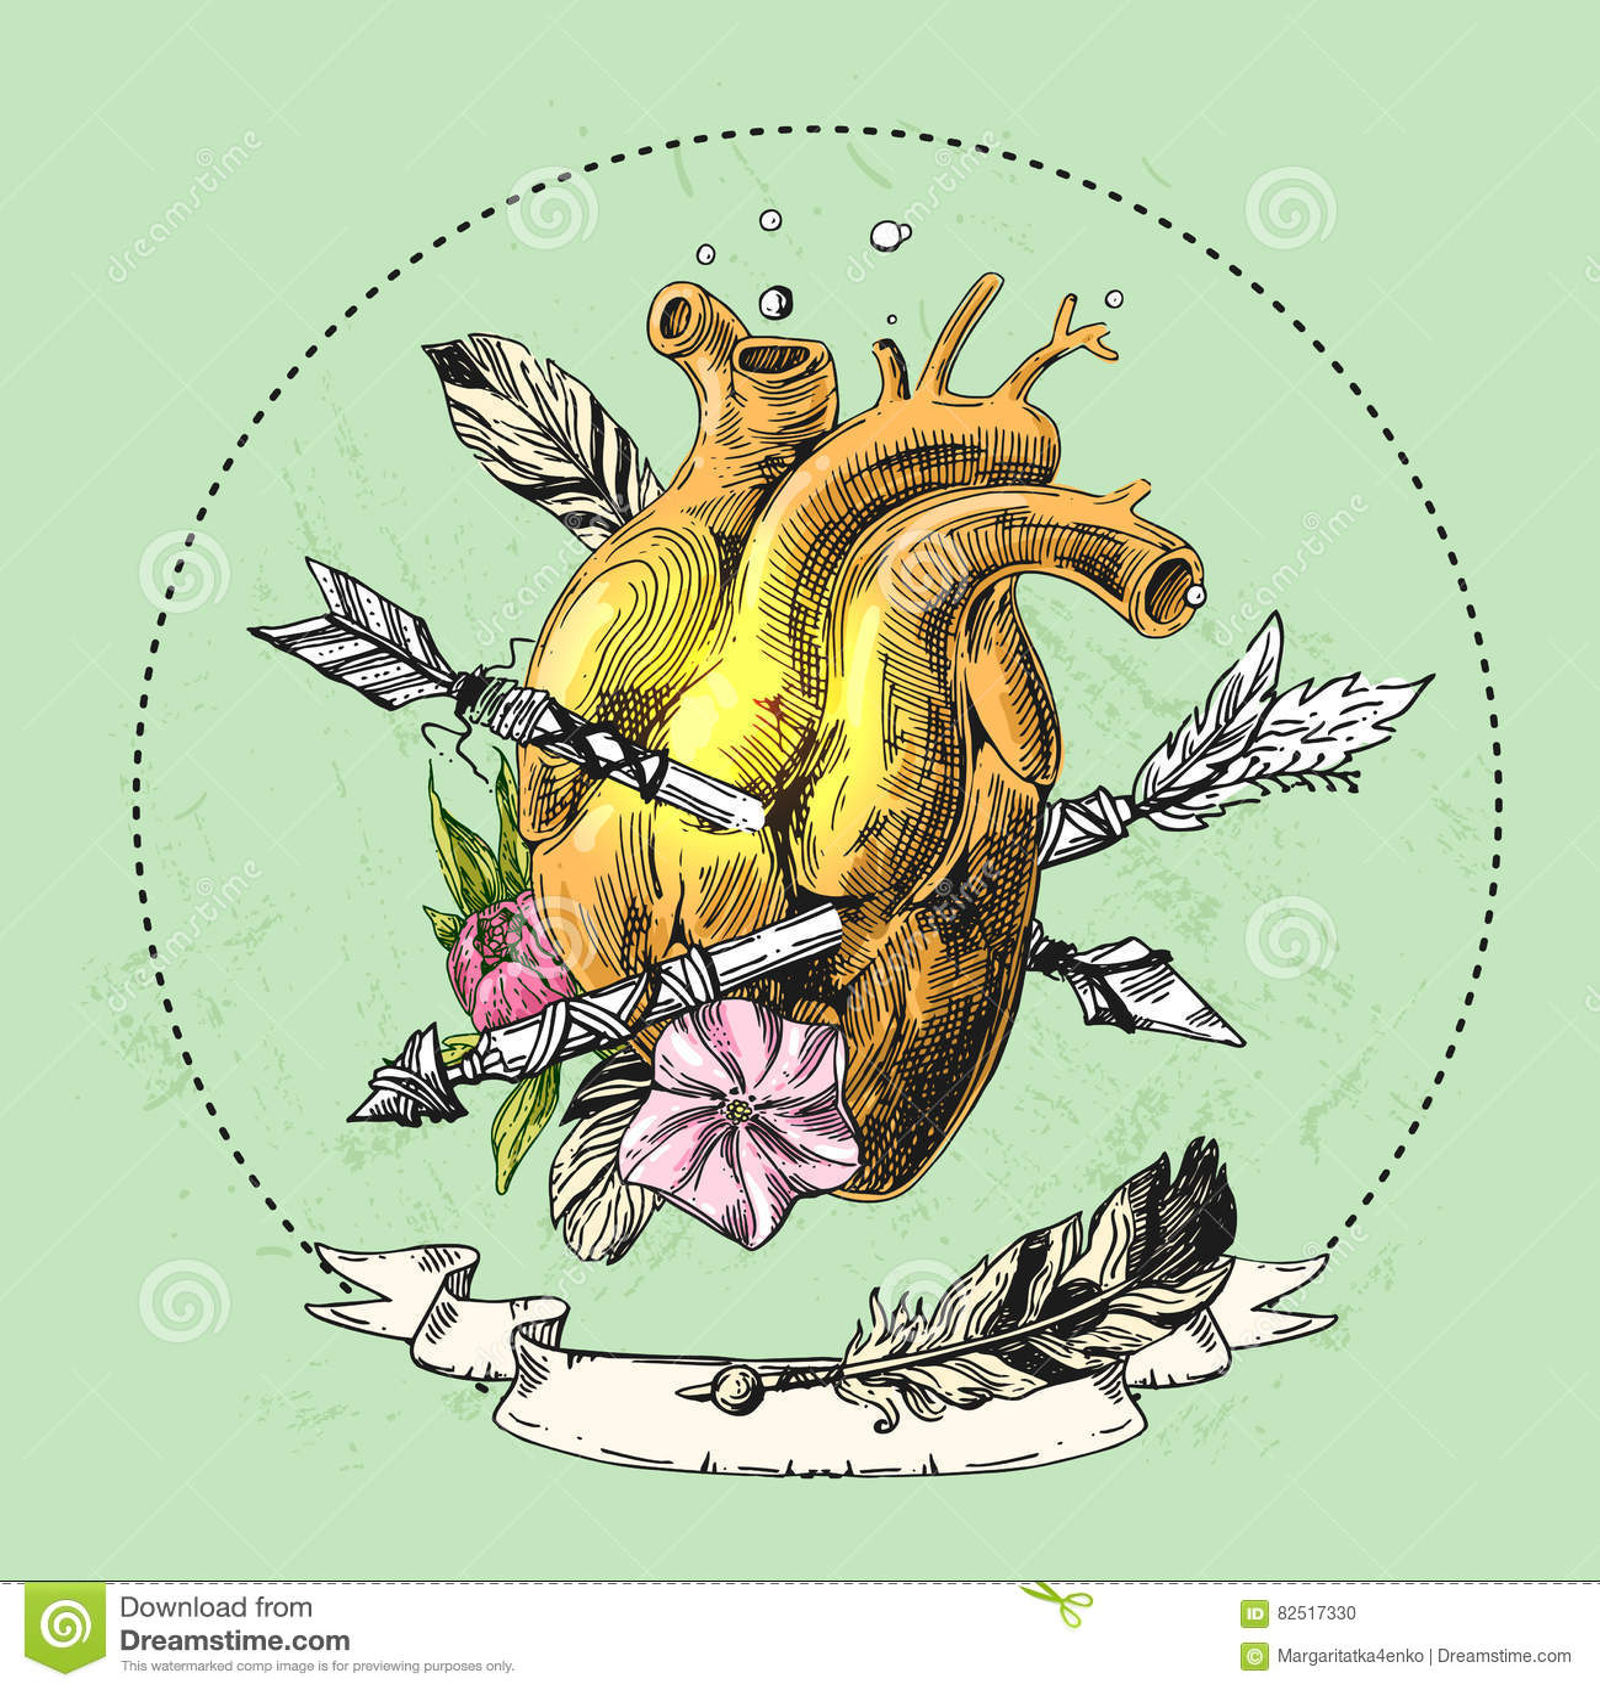 Croquis De Coeur Humain Illustration De Vecteur